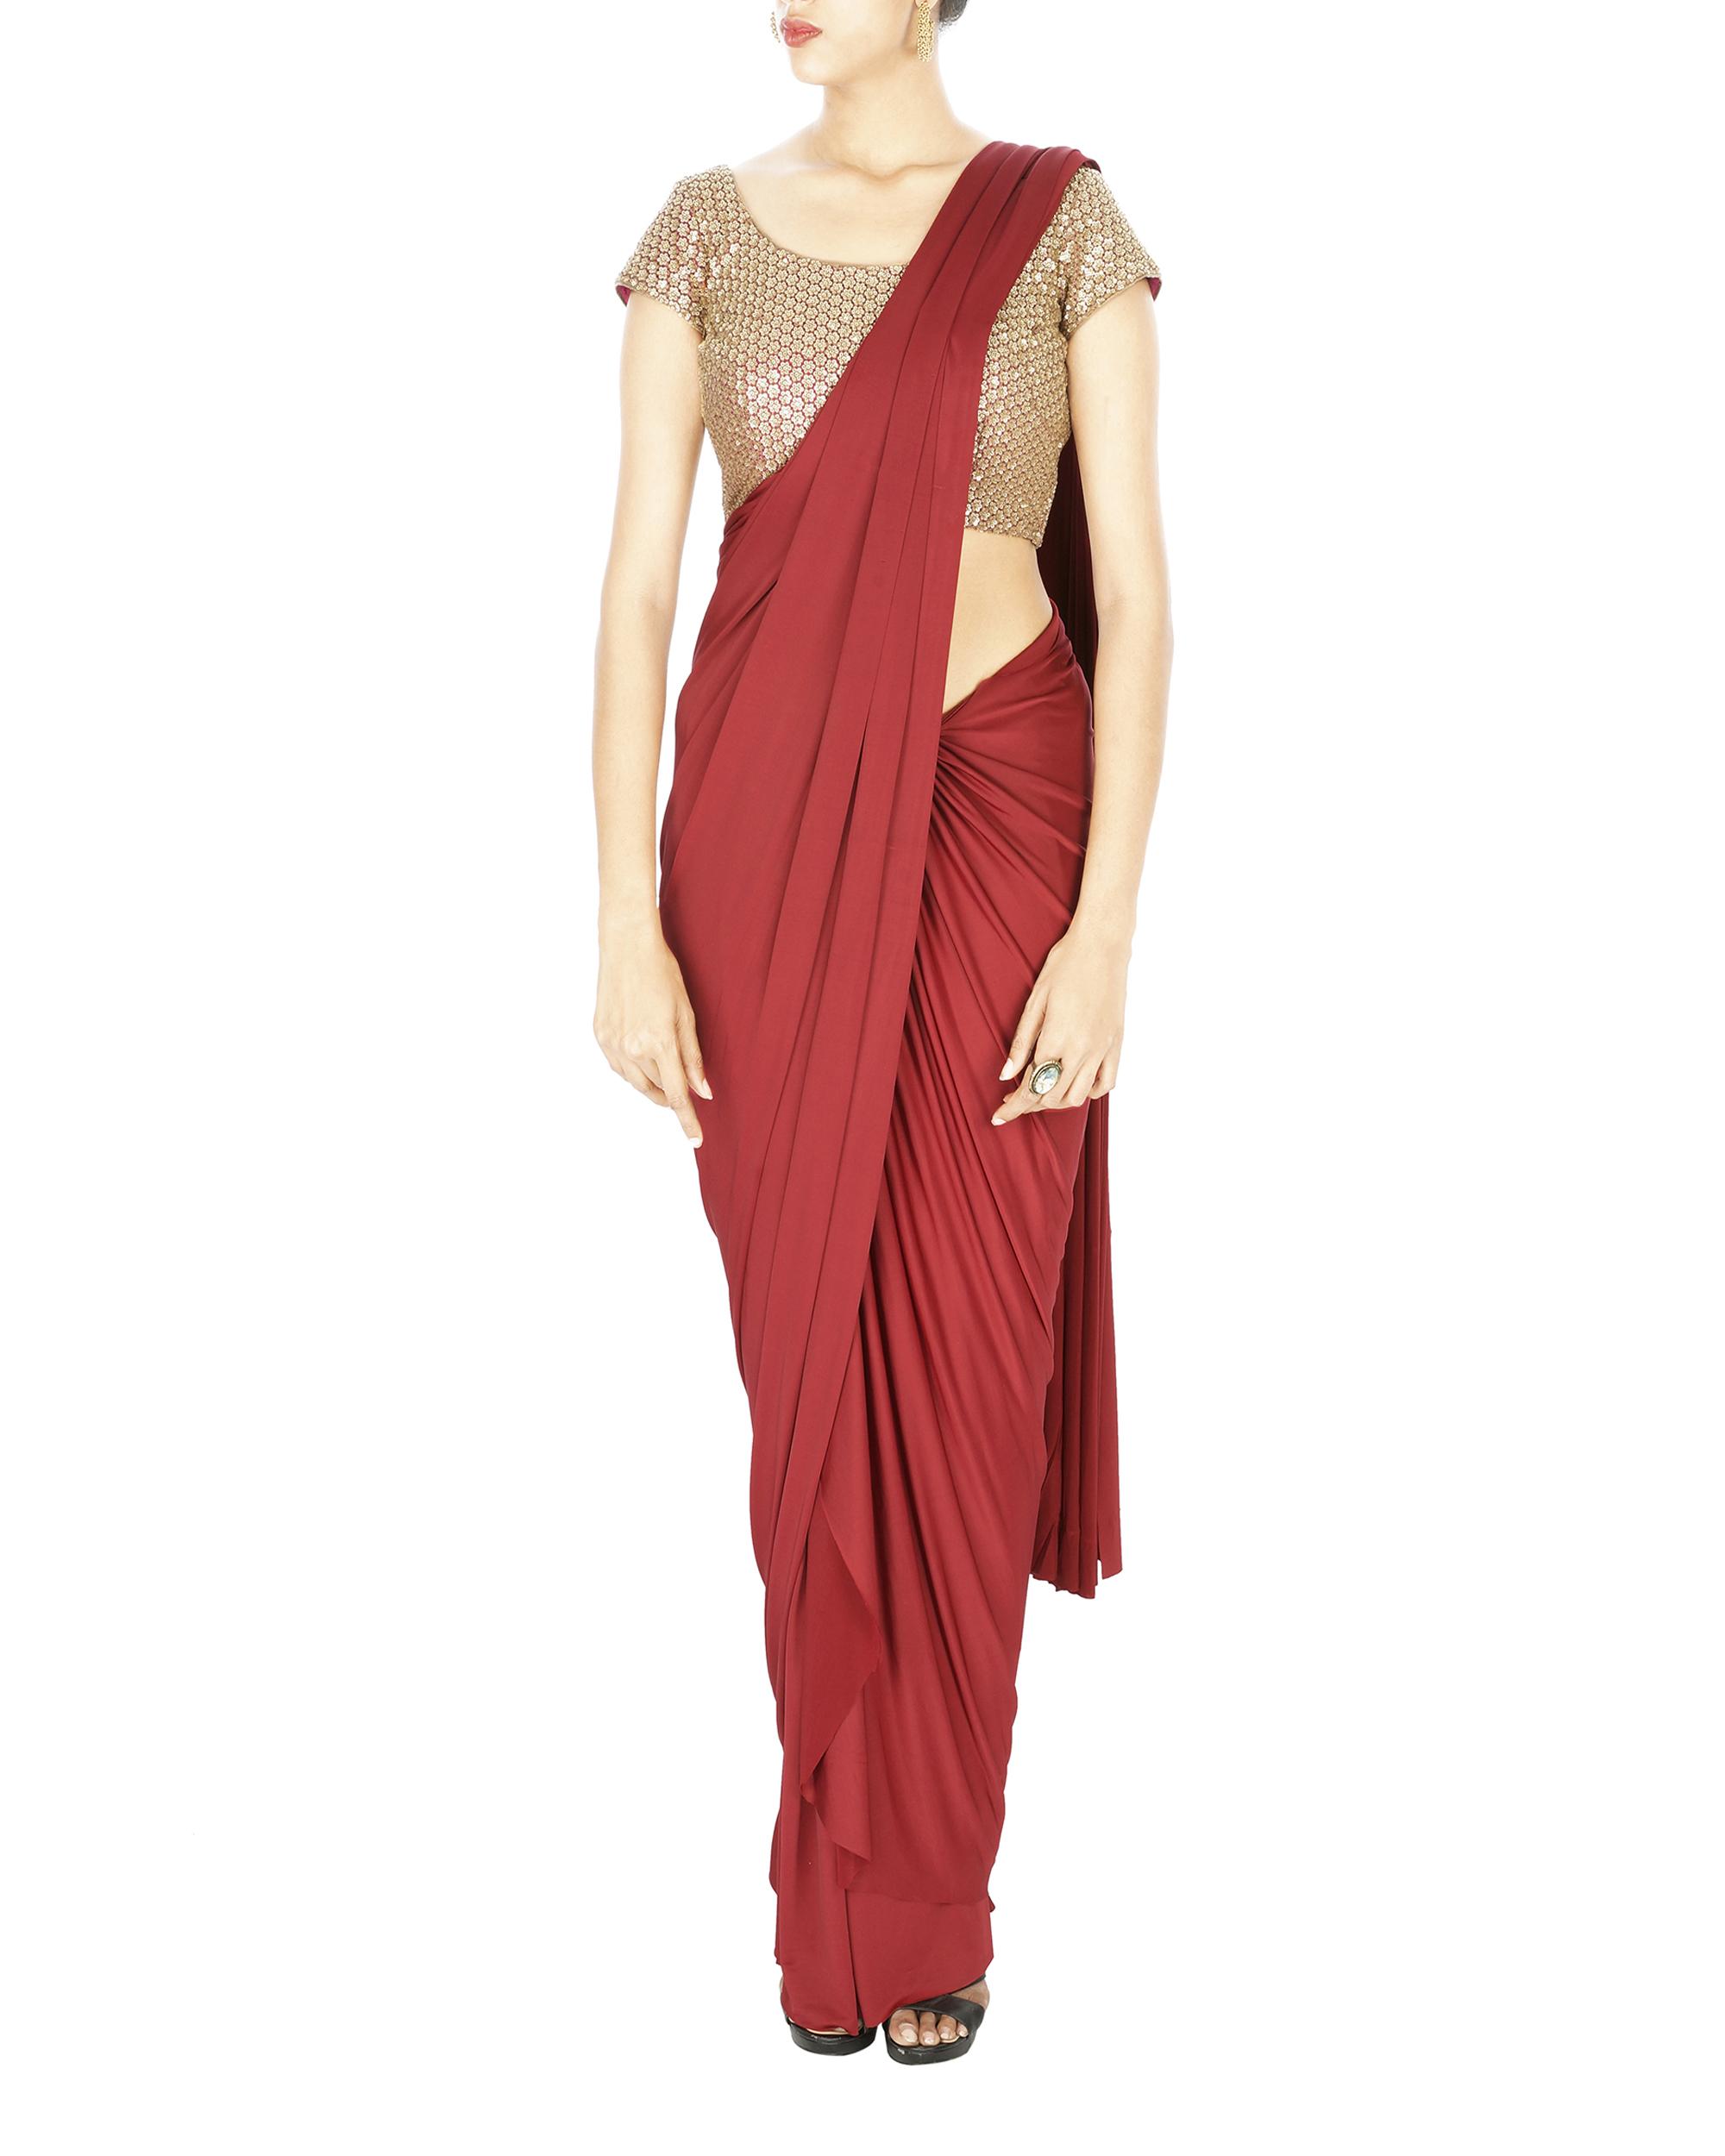 Oxblood lycra pre stitched saree